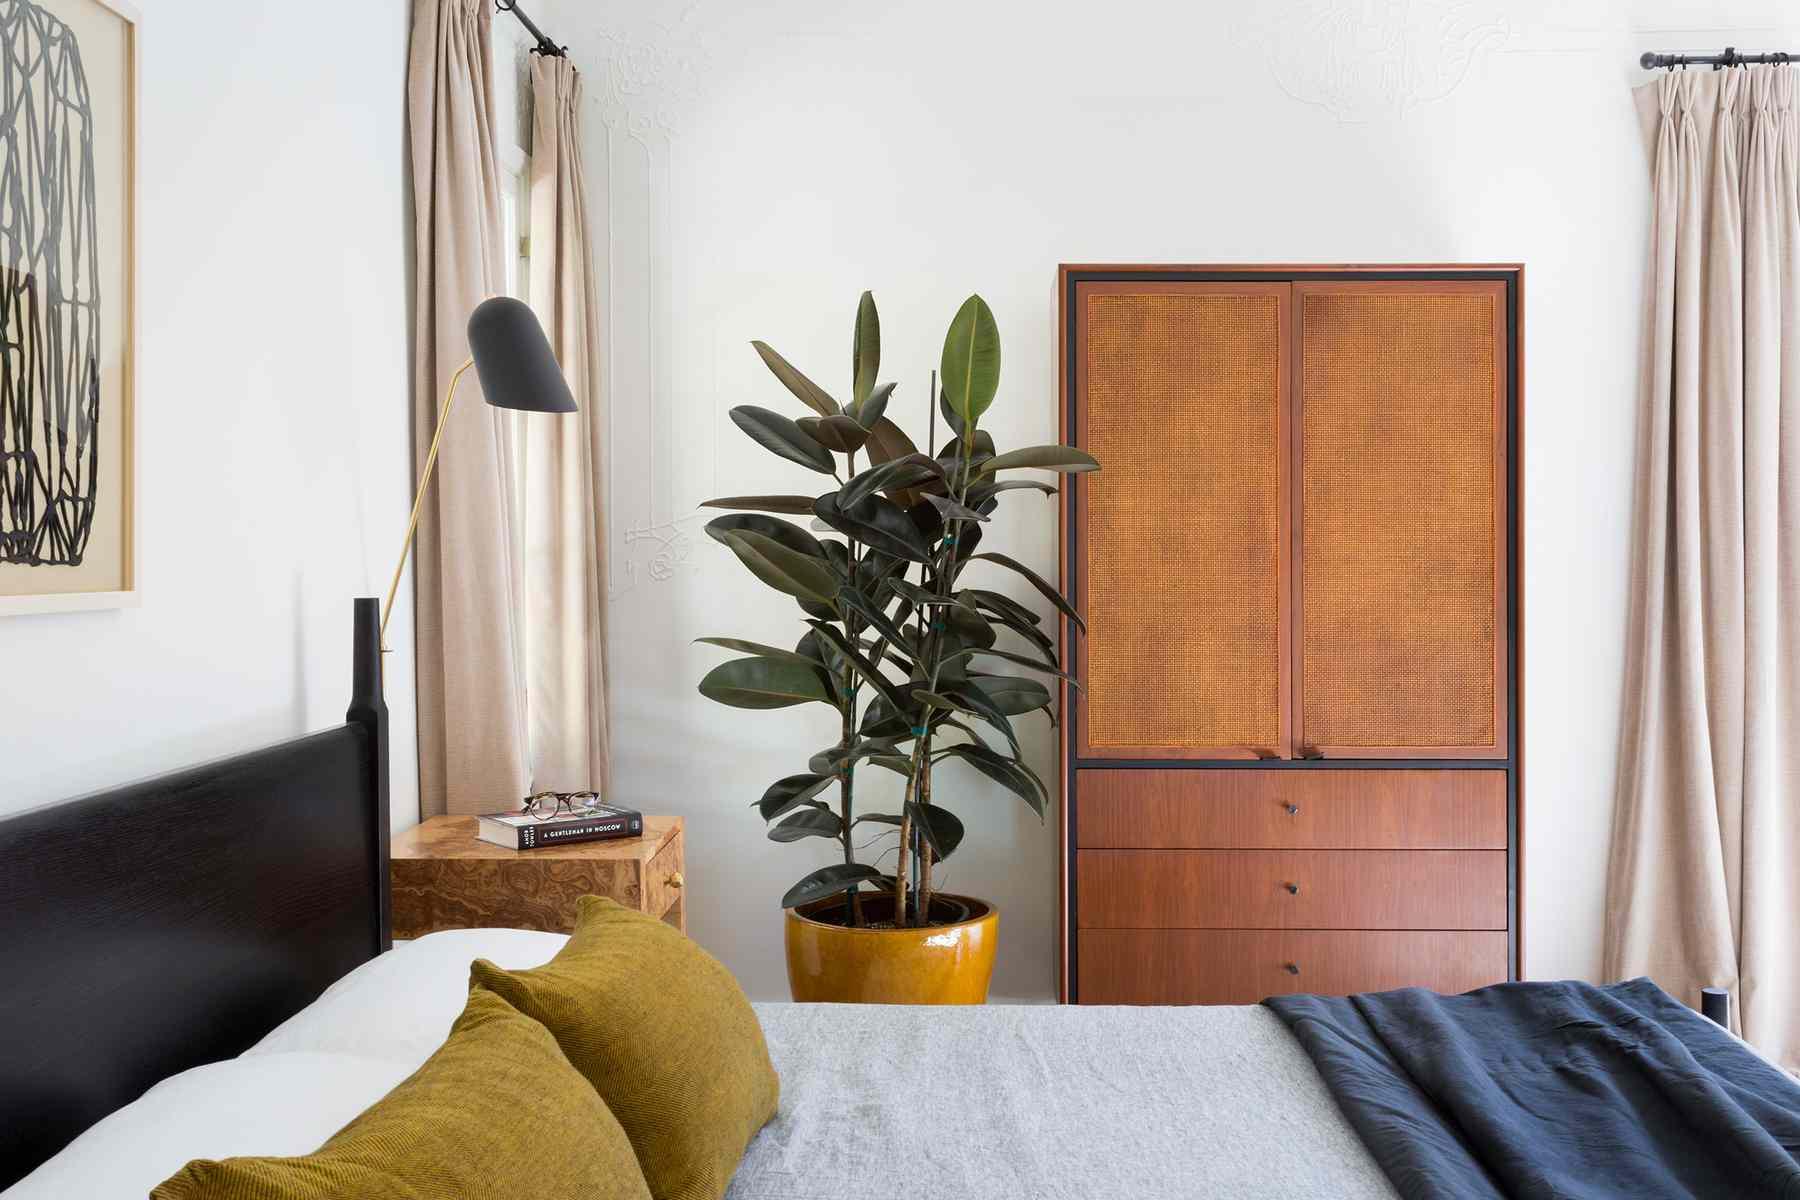 Bedroom with window treatments